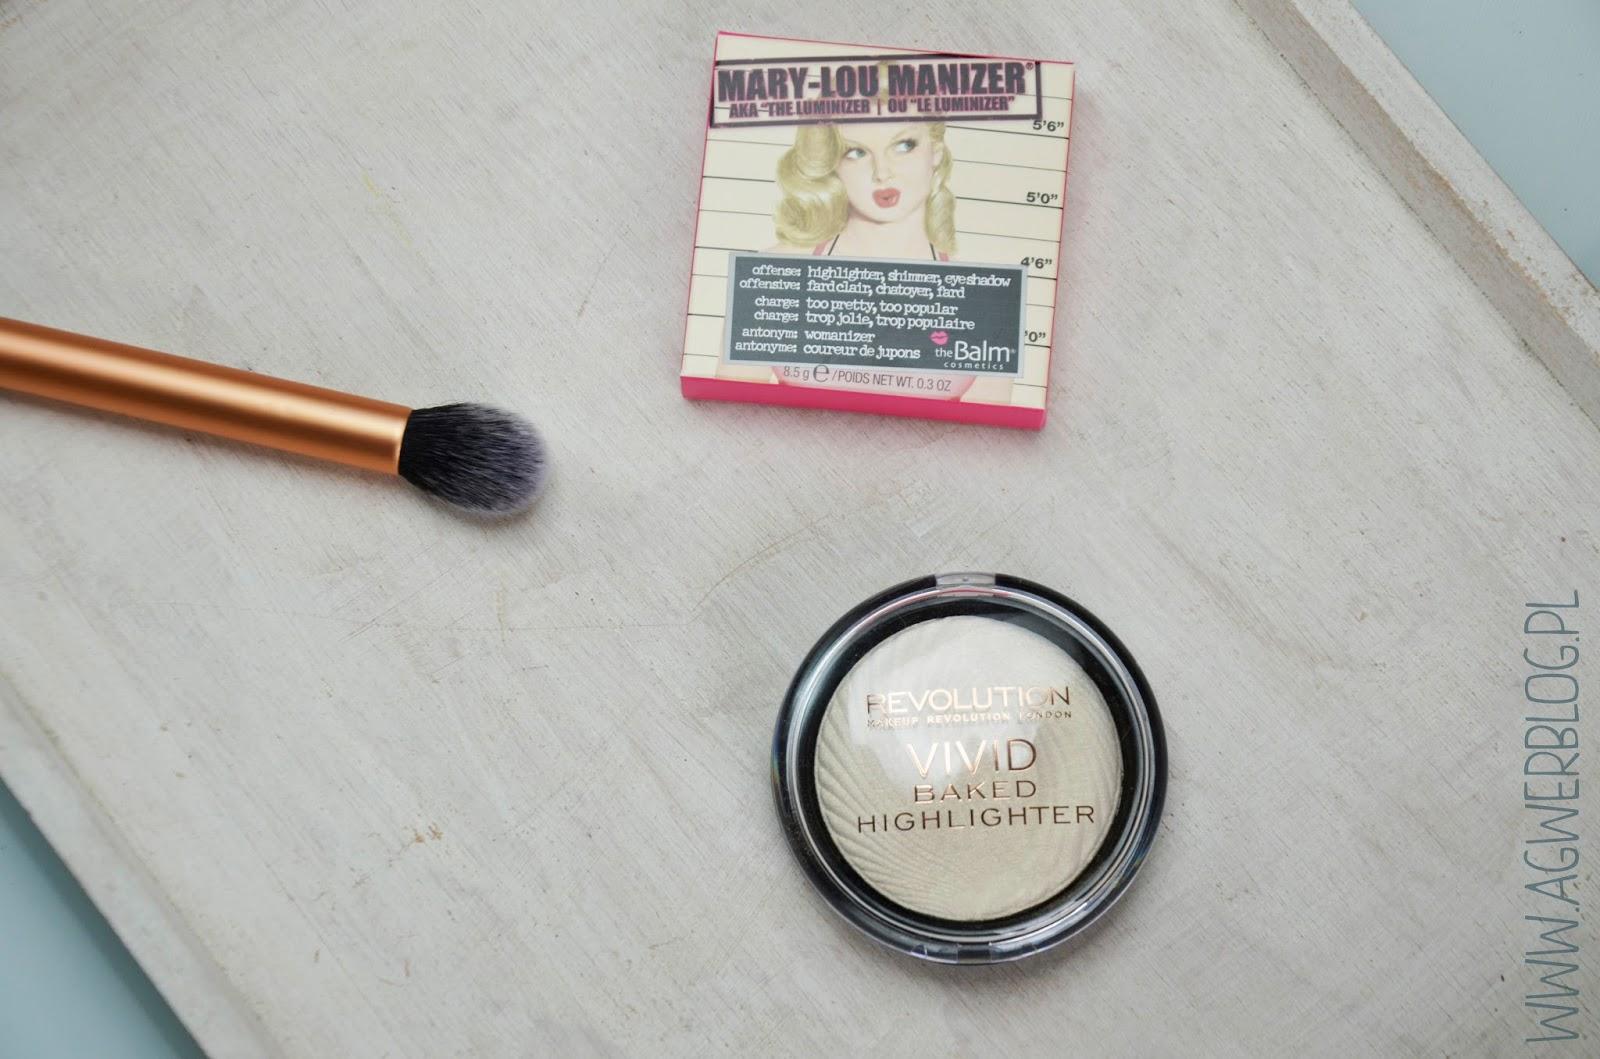 # Zamiennik Mary-Lou Manizer: Golden Lights Makeup Revolution